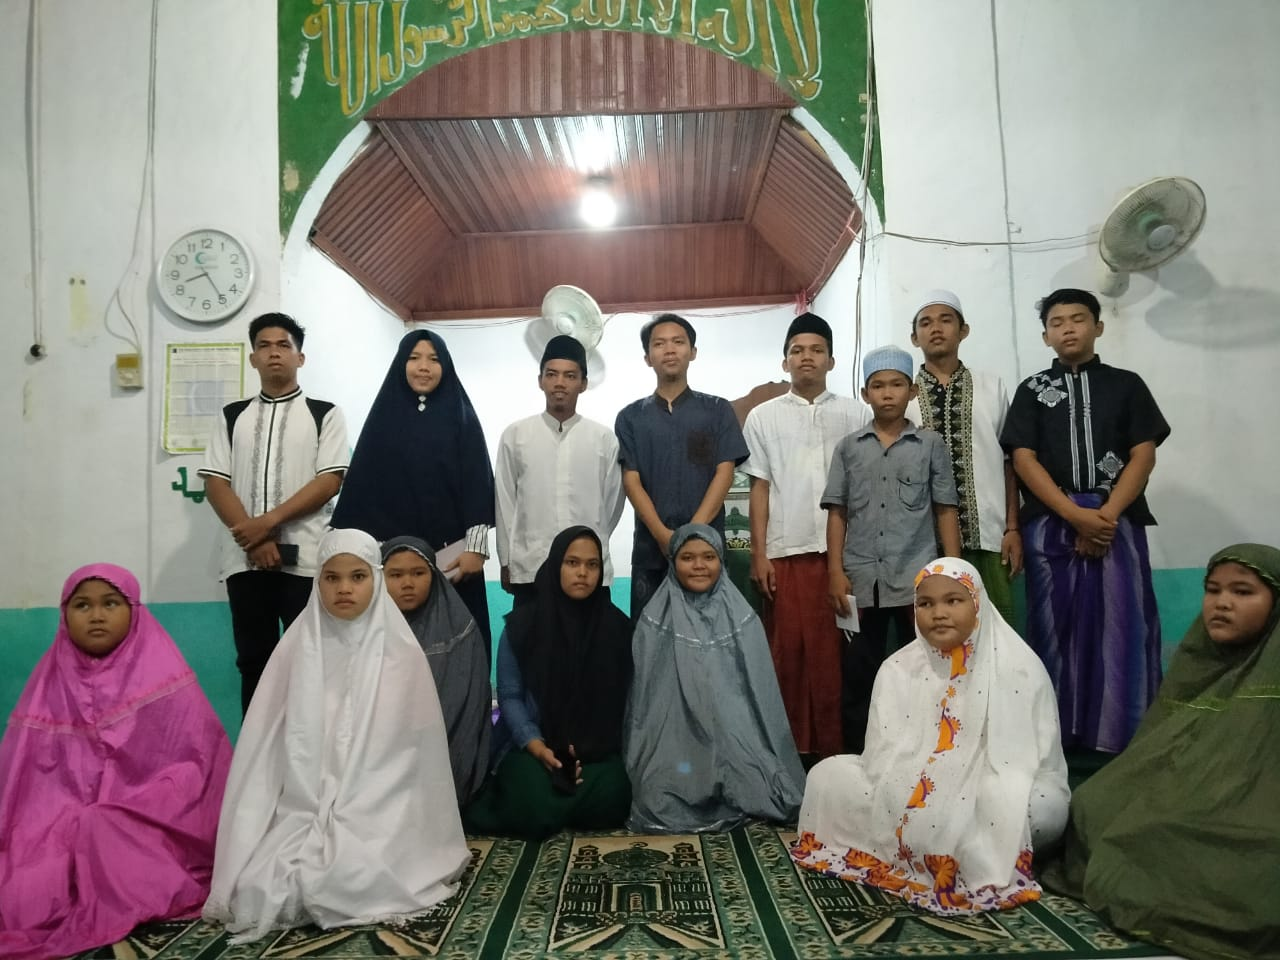 Para pengurus remaja Mesjid Nurul Huda dan Taqwa Desa Bottot foto bersama dengan anak Yatim seusai penyerahan santunan. Foto: Rakyatsumut.com/Ahmad Afip